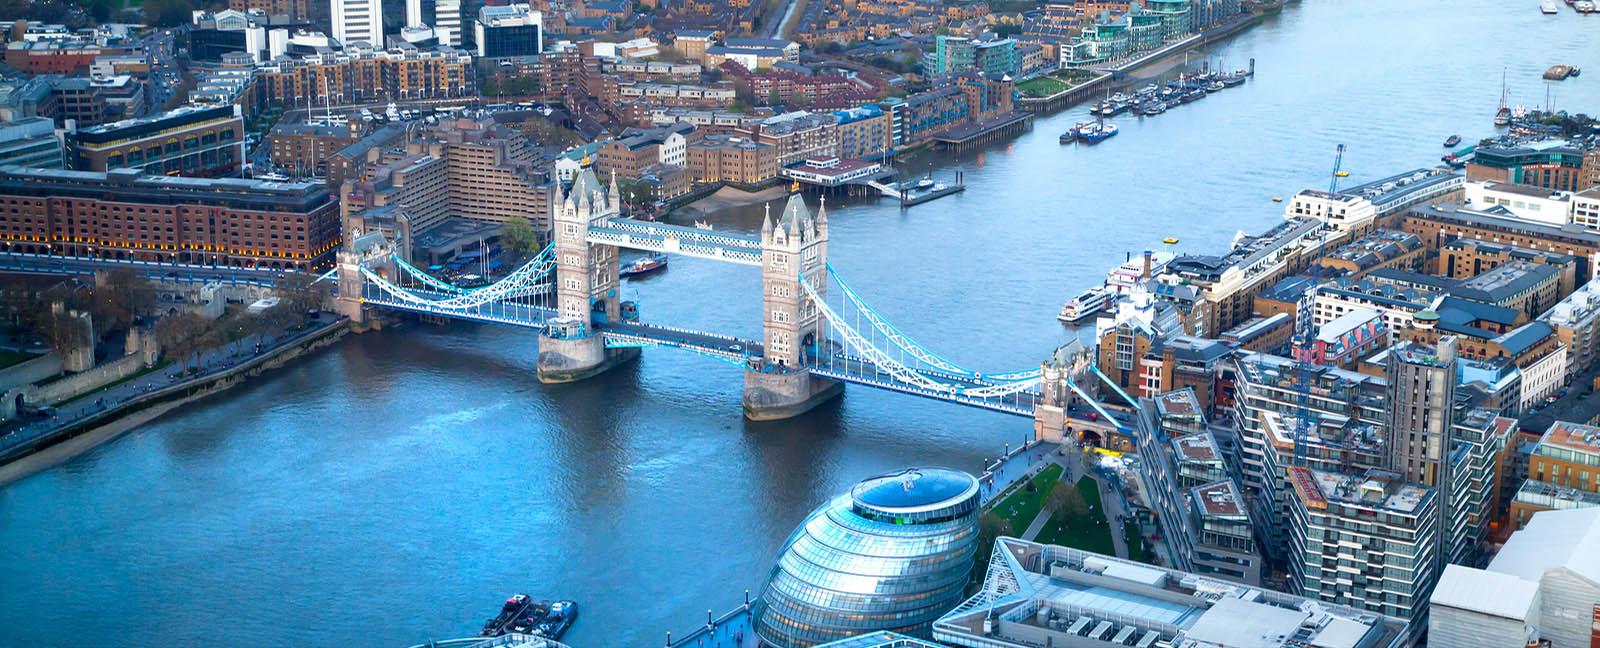 bigstock-City-of-London-panorama-at-sun-111888209-NEW